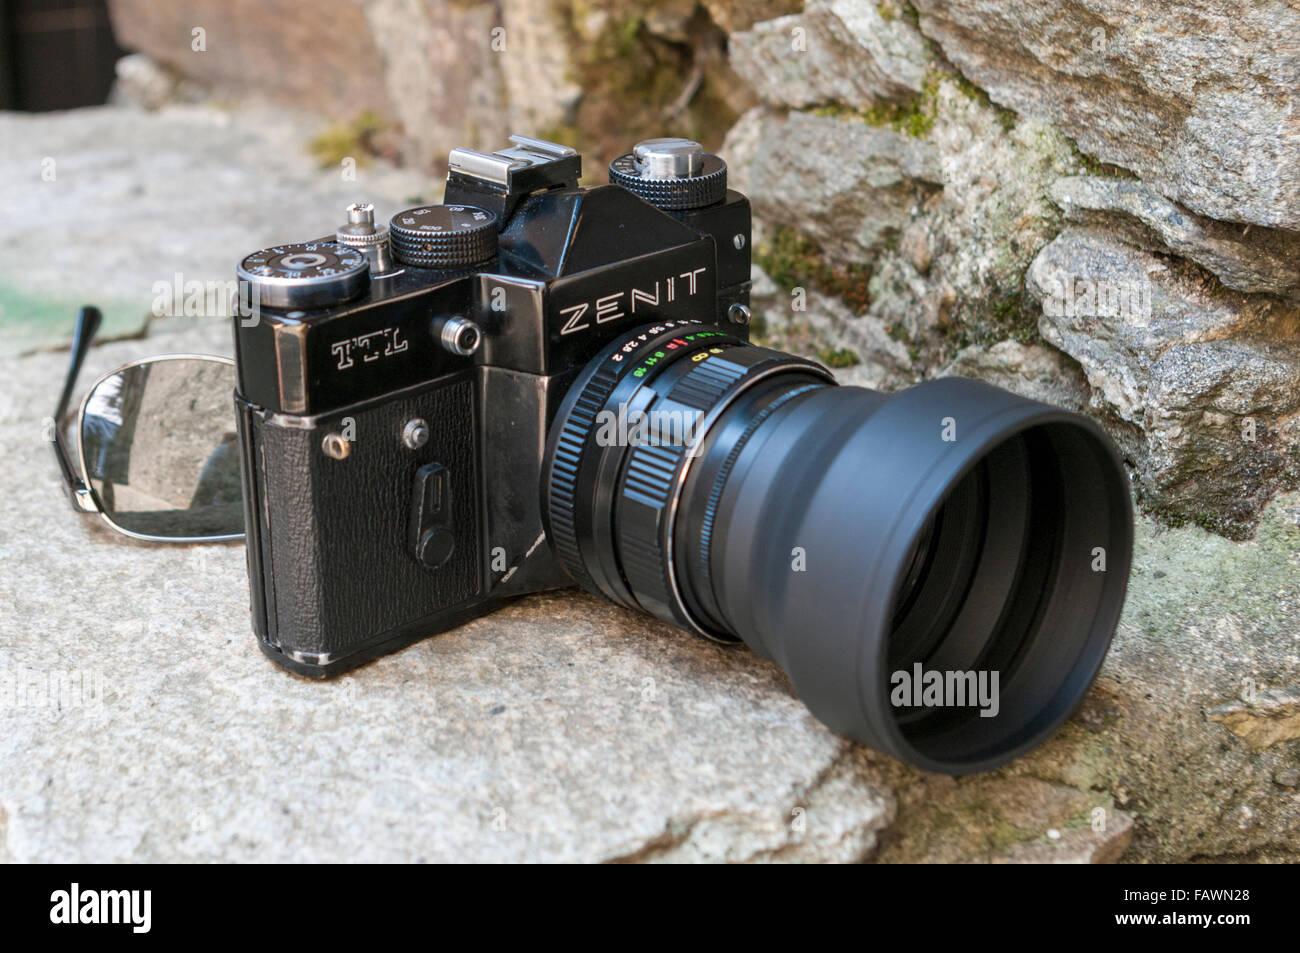 Export version of the Zenit TTL, a vintage Soviet 35mm film single lens reflex (SLR) camera manufactured by KMZ. - Stock Image